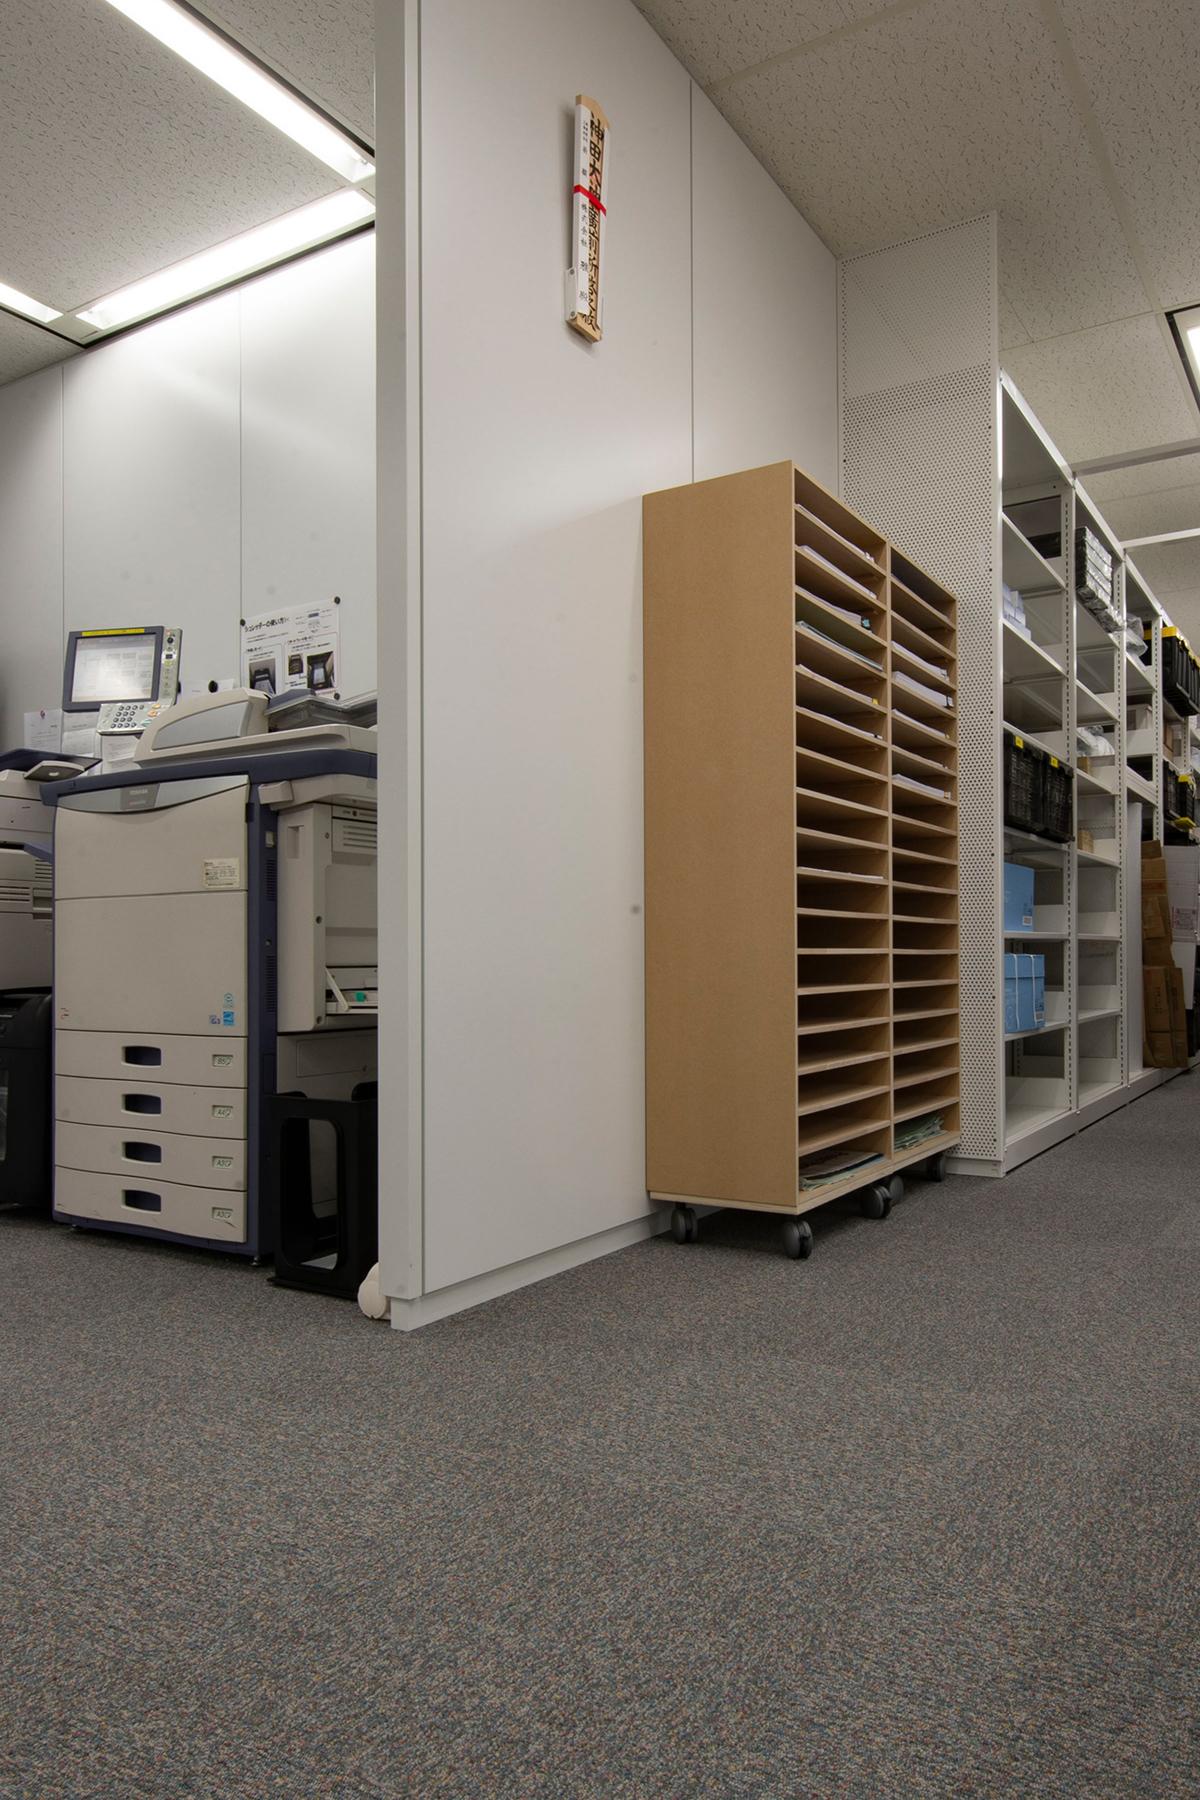 図面管理の共有化 | A3書類棚